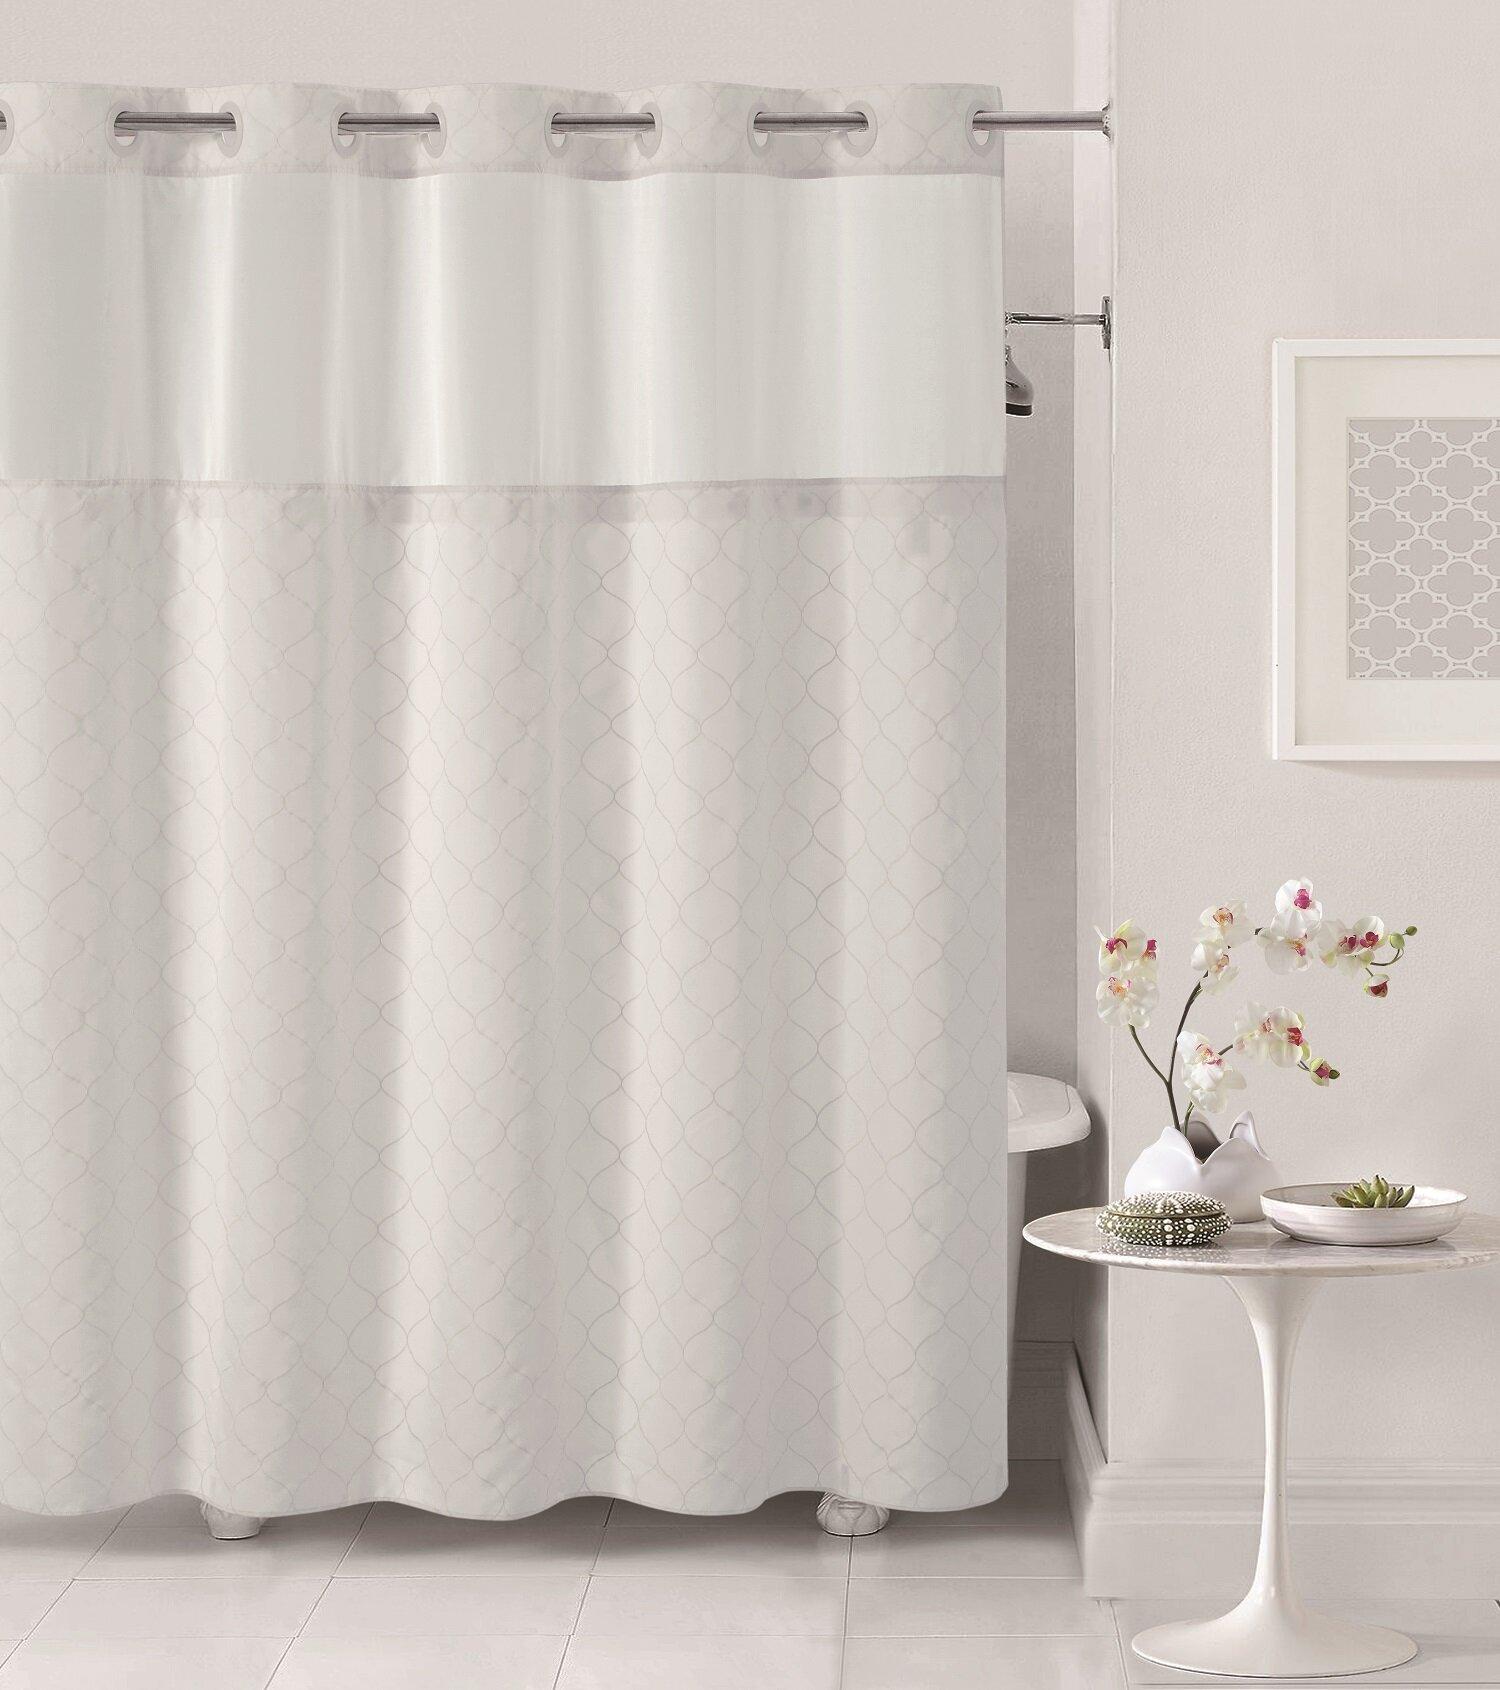 Hookless Mosaic Shower Curtain Reviews